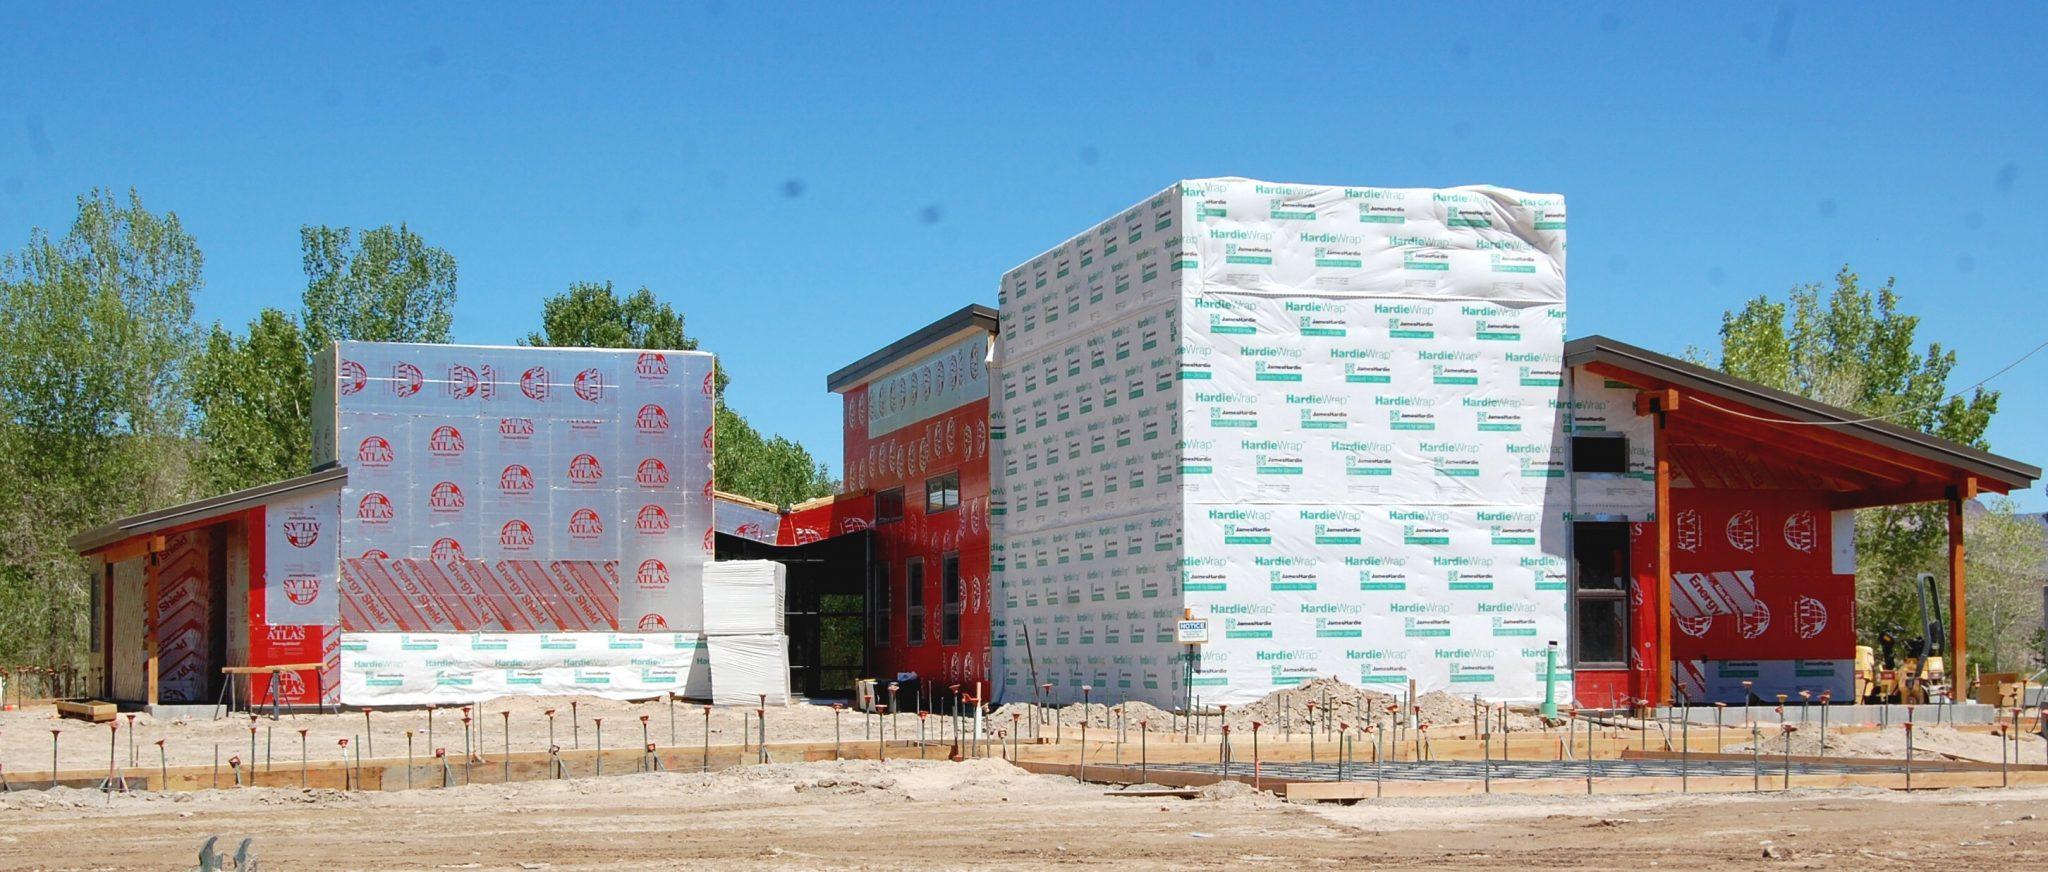 Construction on National Wildlife Refuge Center moving along